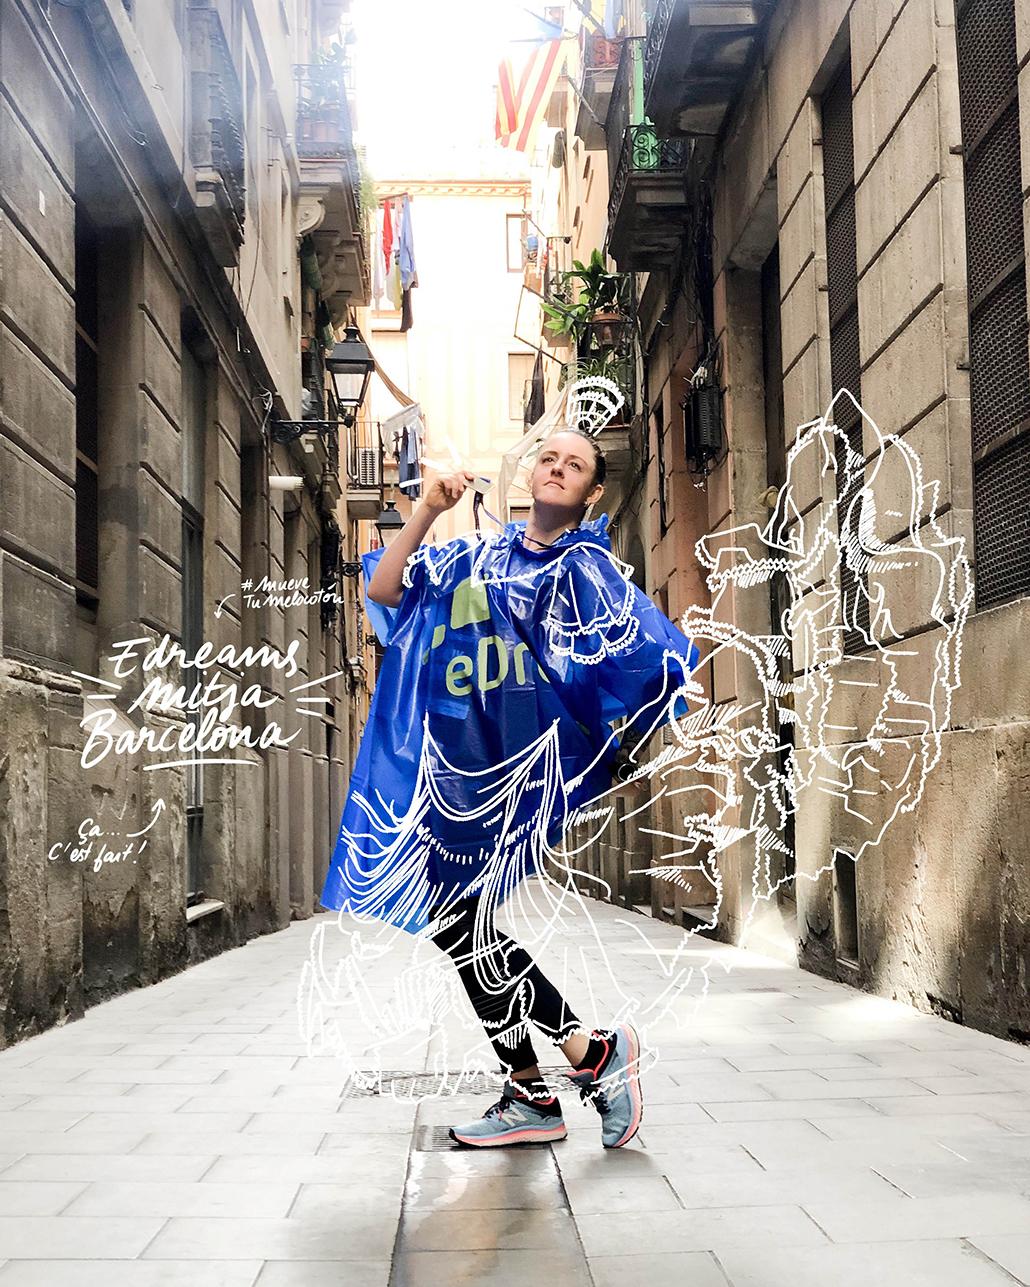 Barcelone Barcelona Semi-Marathon eDreams Mitja Barcelona Course Run Running Semi-Marathon Espagne CR